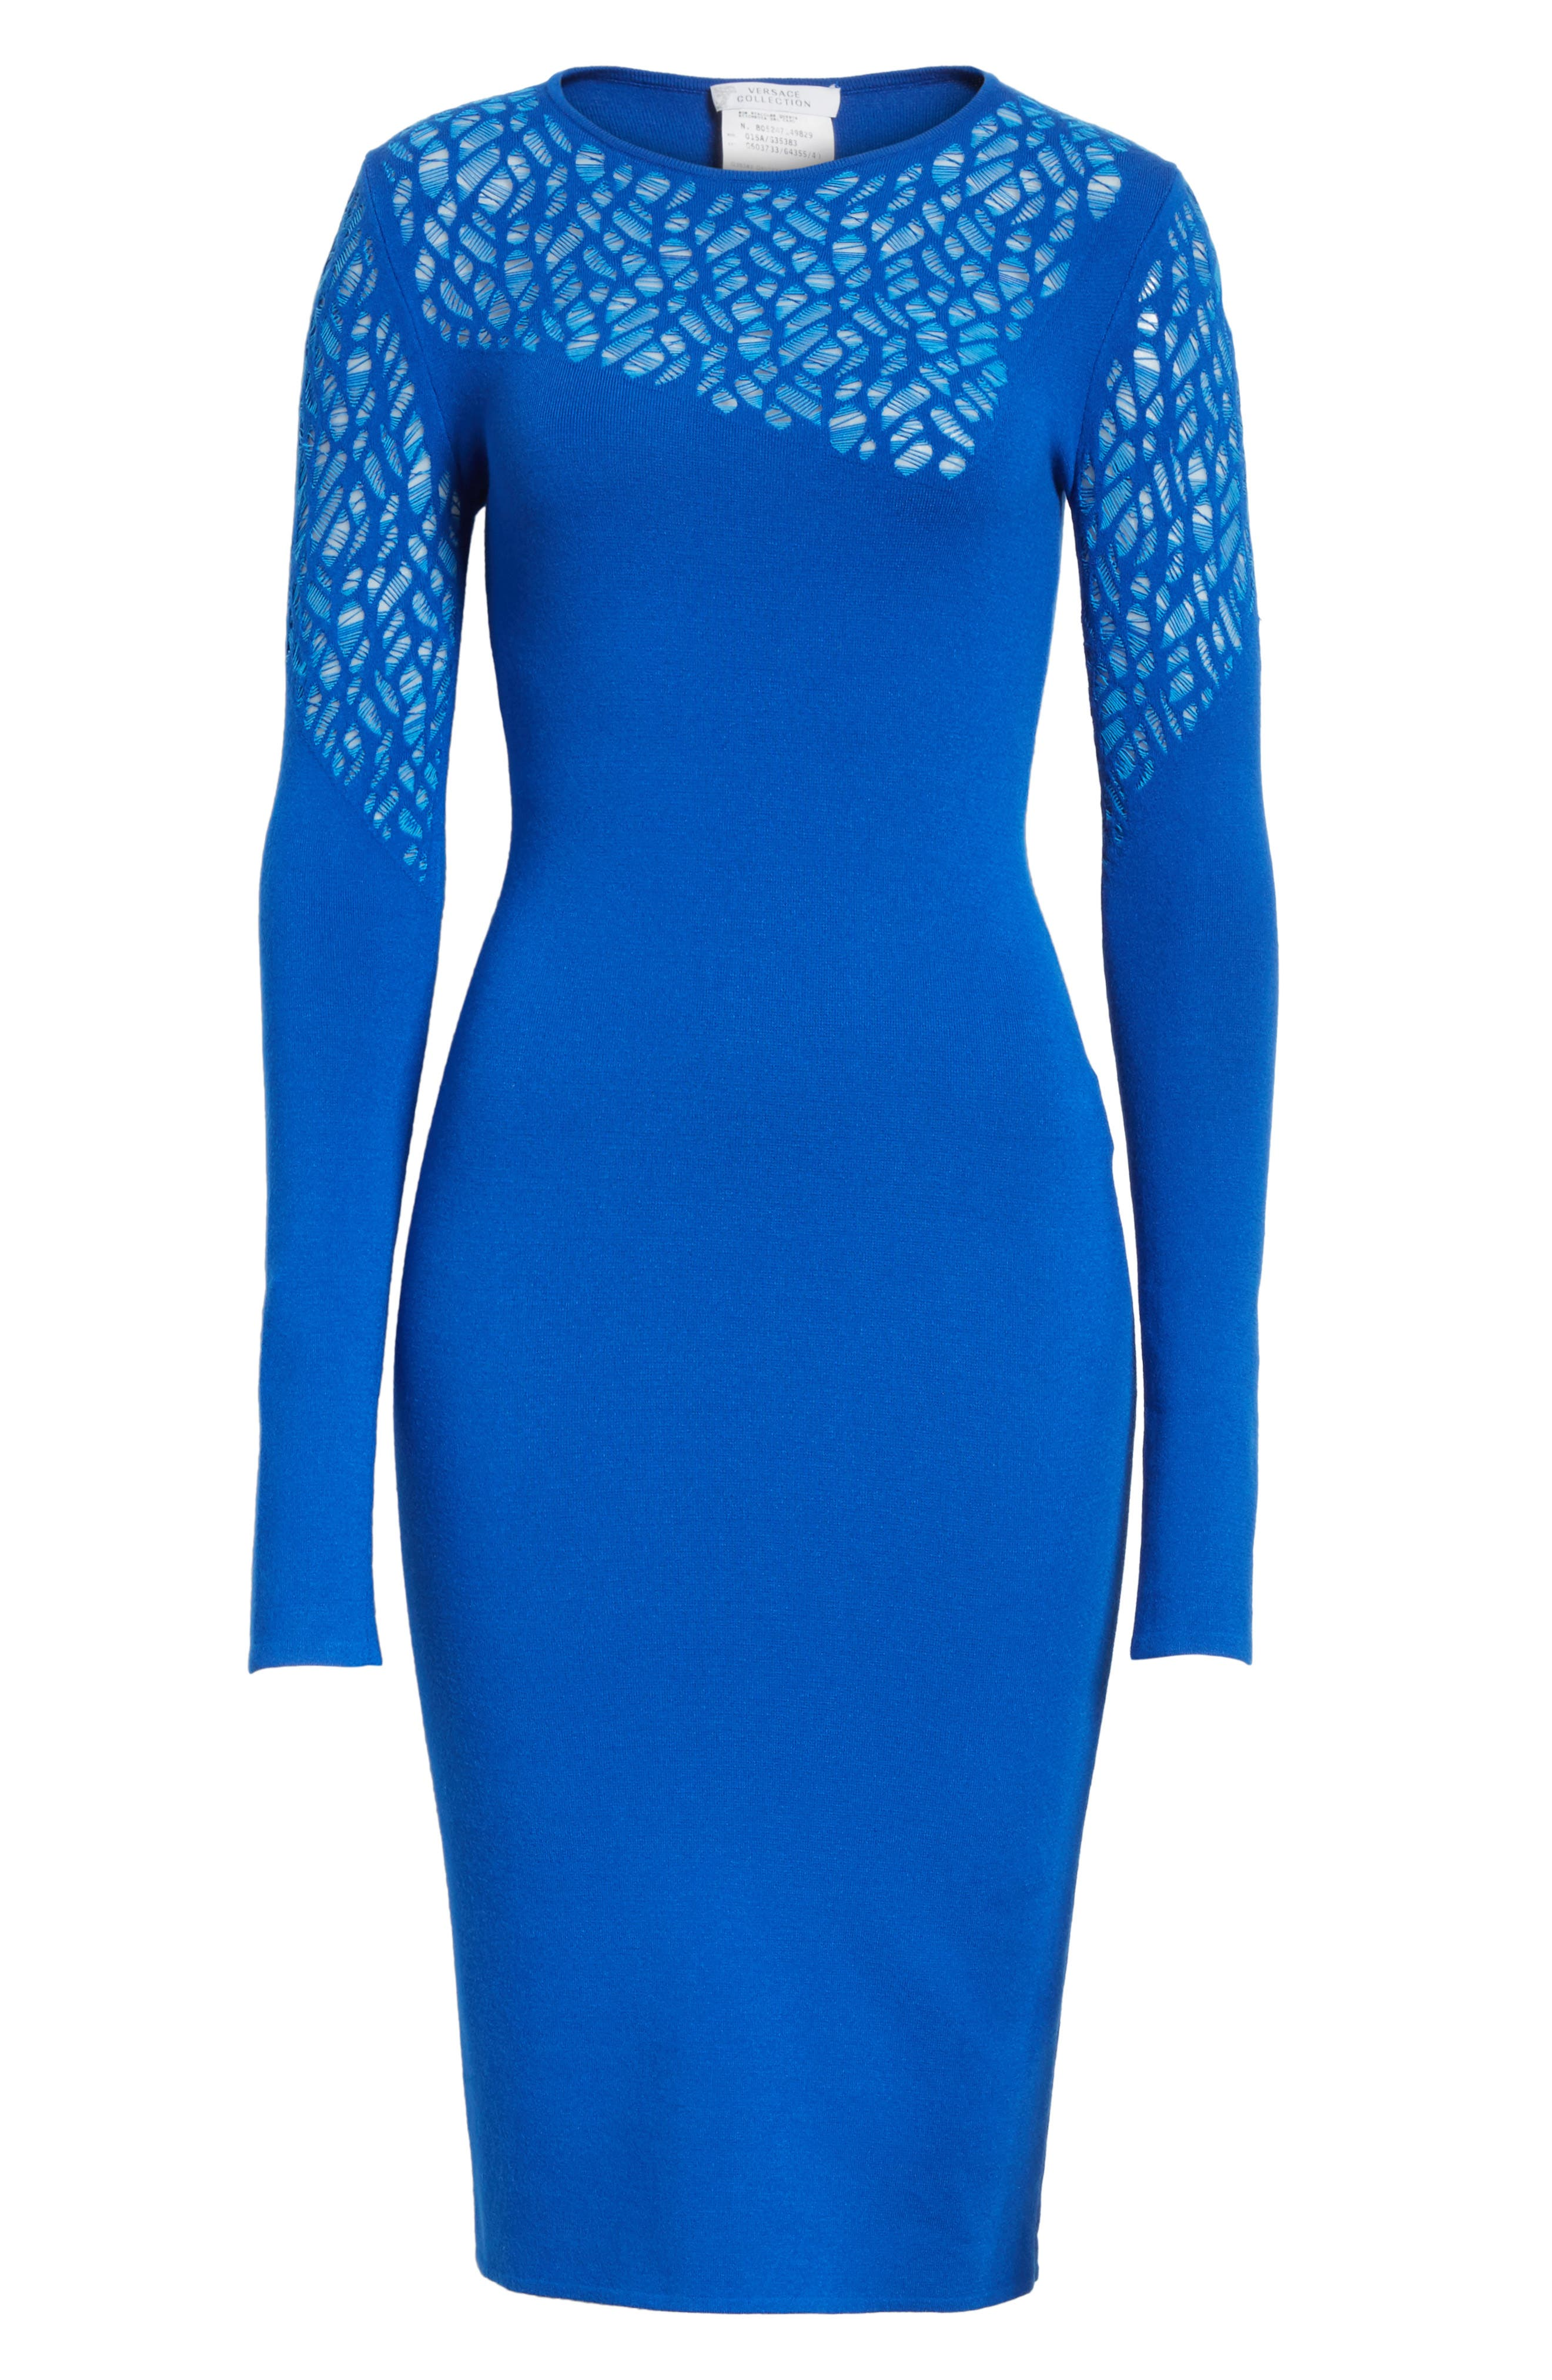 Contrast Stitch Knit Dress,                             Alternate thumbnail 6, color,                             Royal Blue/ Light Blue